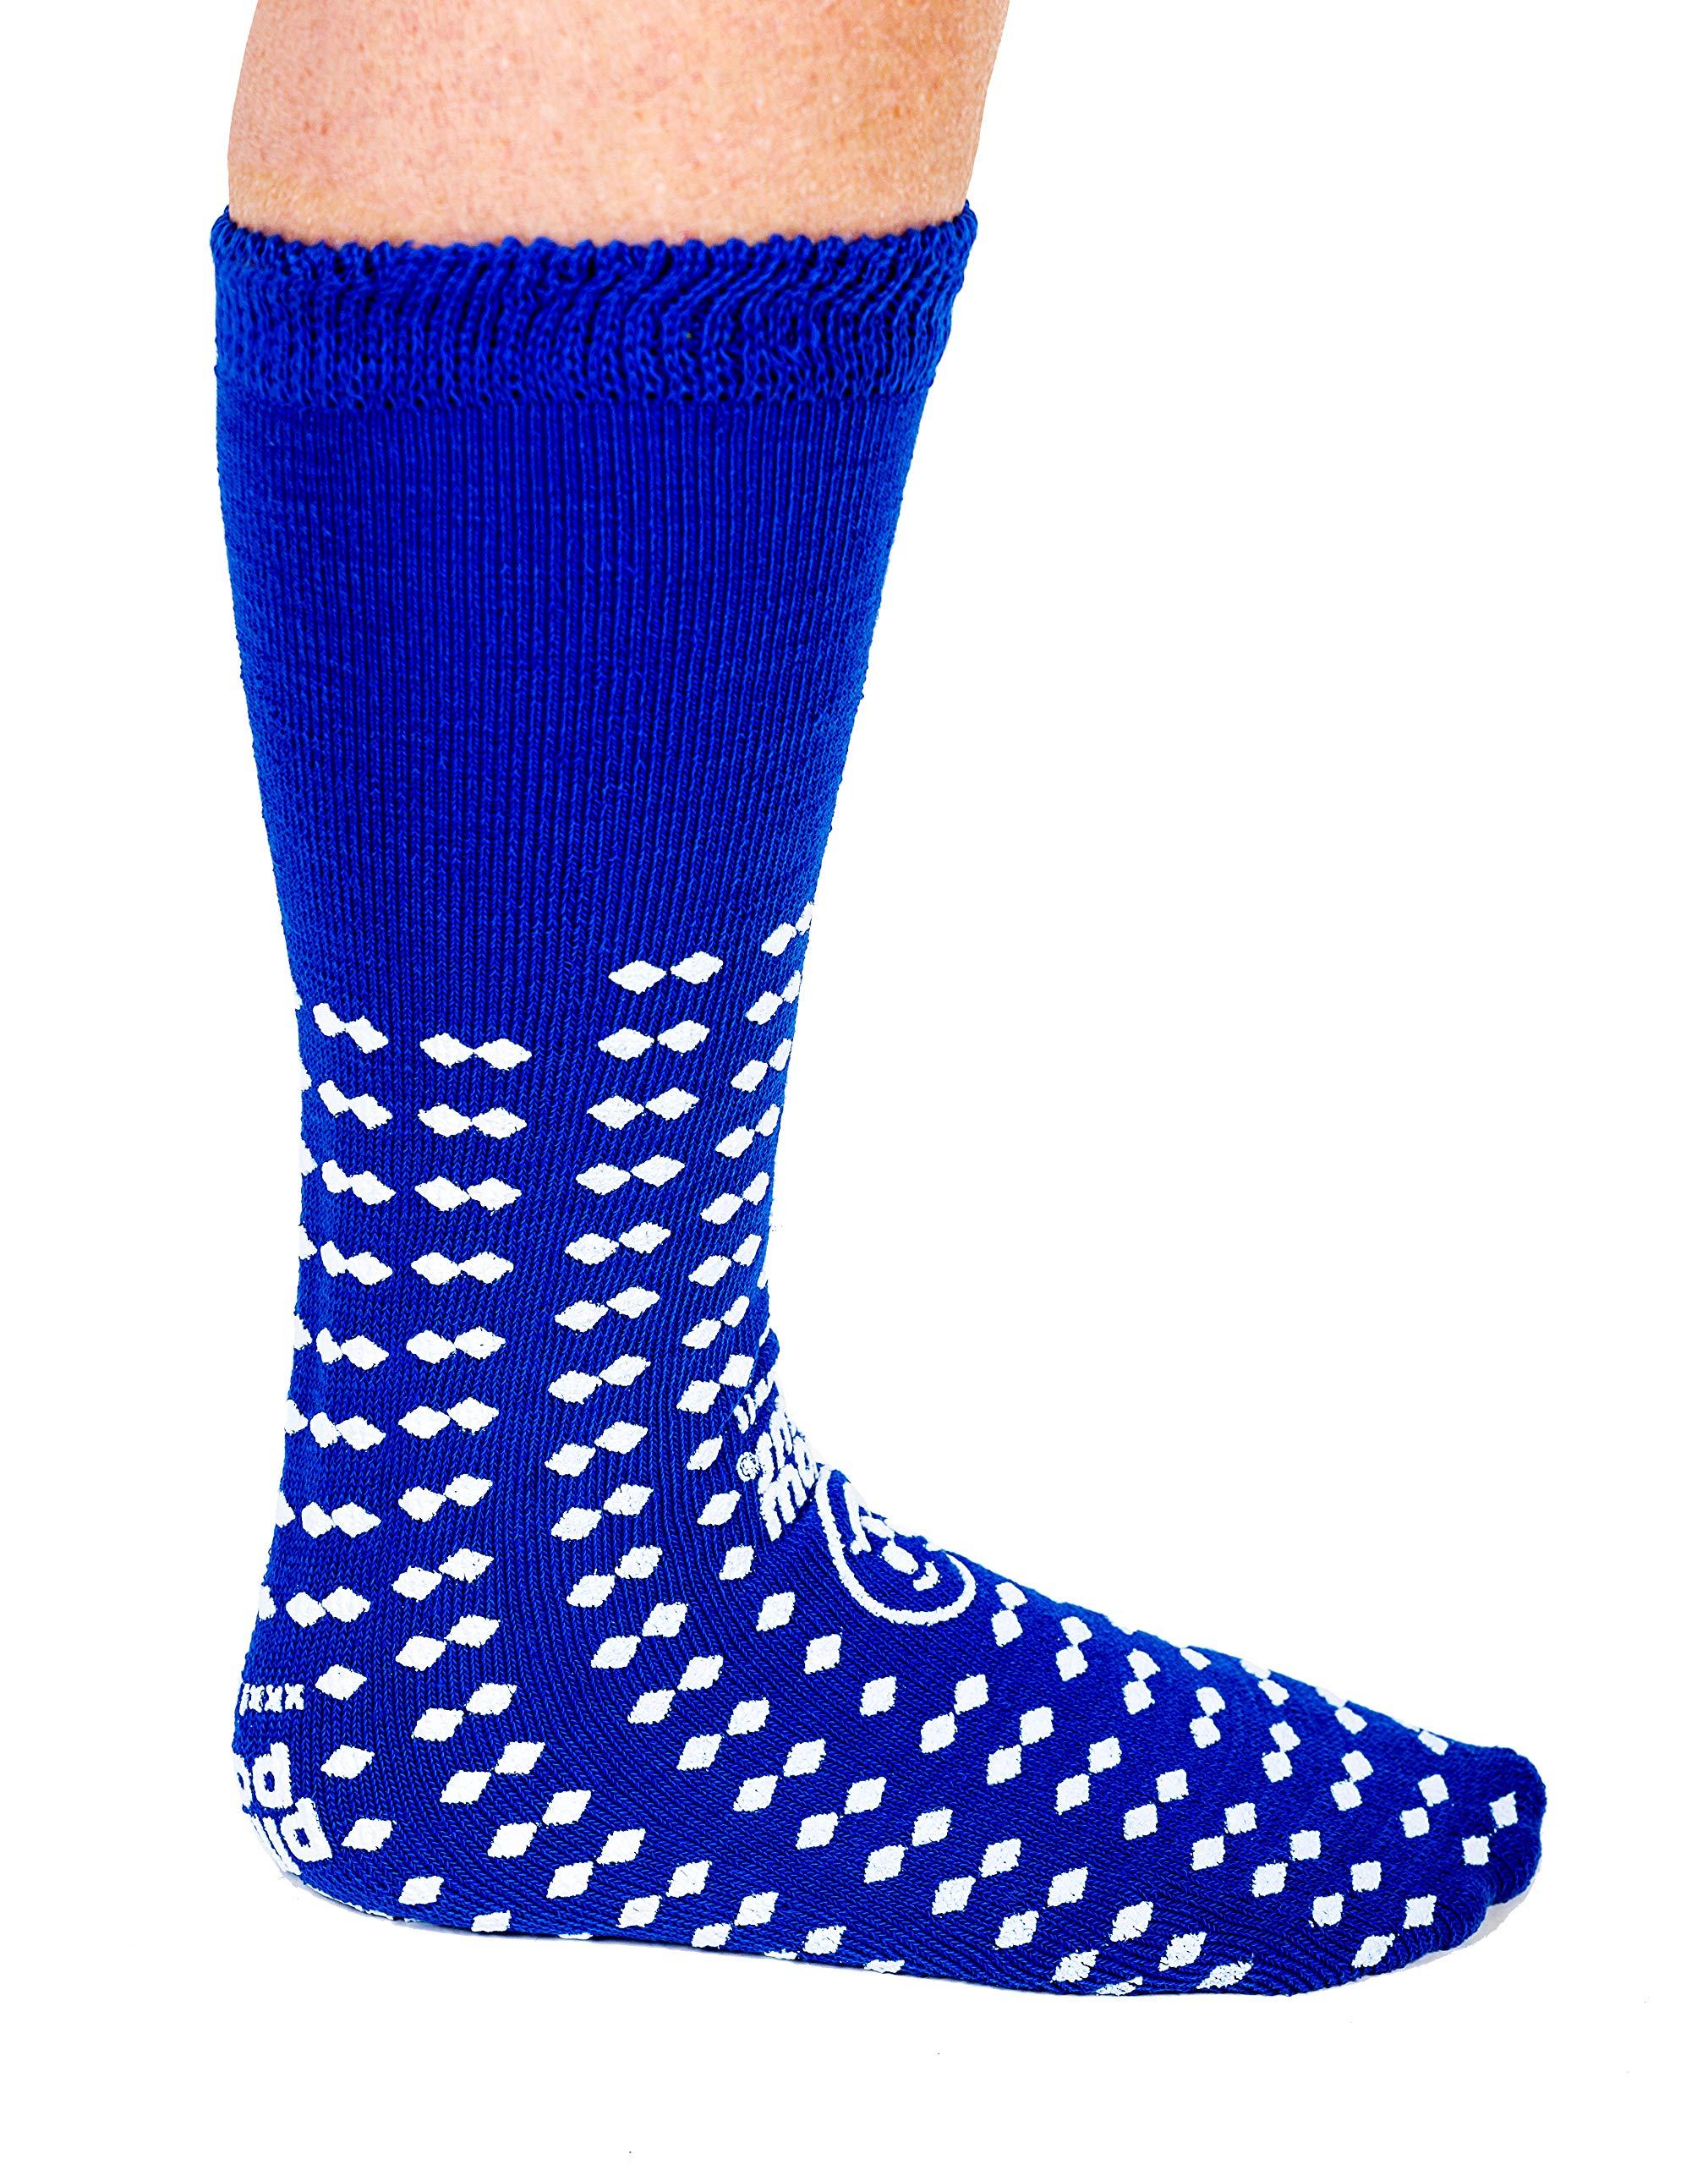 Wraparound Treaded Slip Stop Socks 360-Degree Tread (Blue XXXL Extra Wide Bariatric) (4 Pairs)